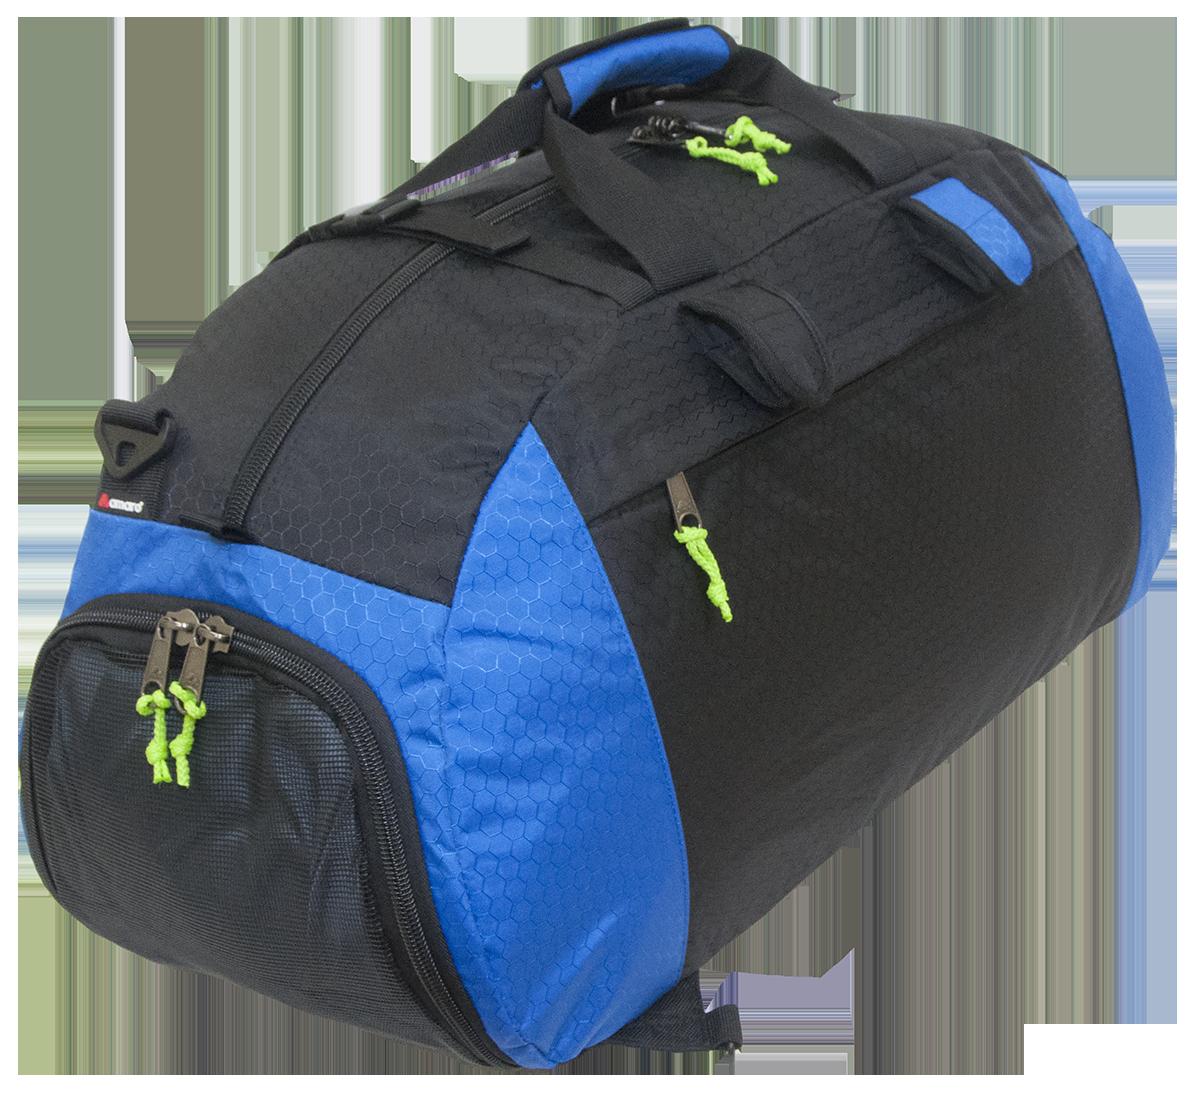 Clipart backpack blue item. Amaro warzone lacrosse bag